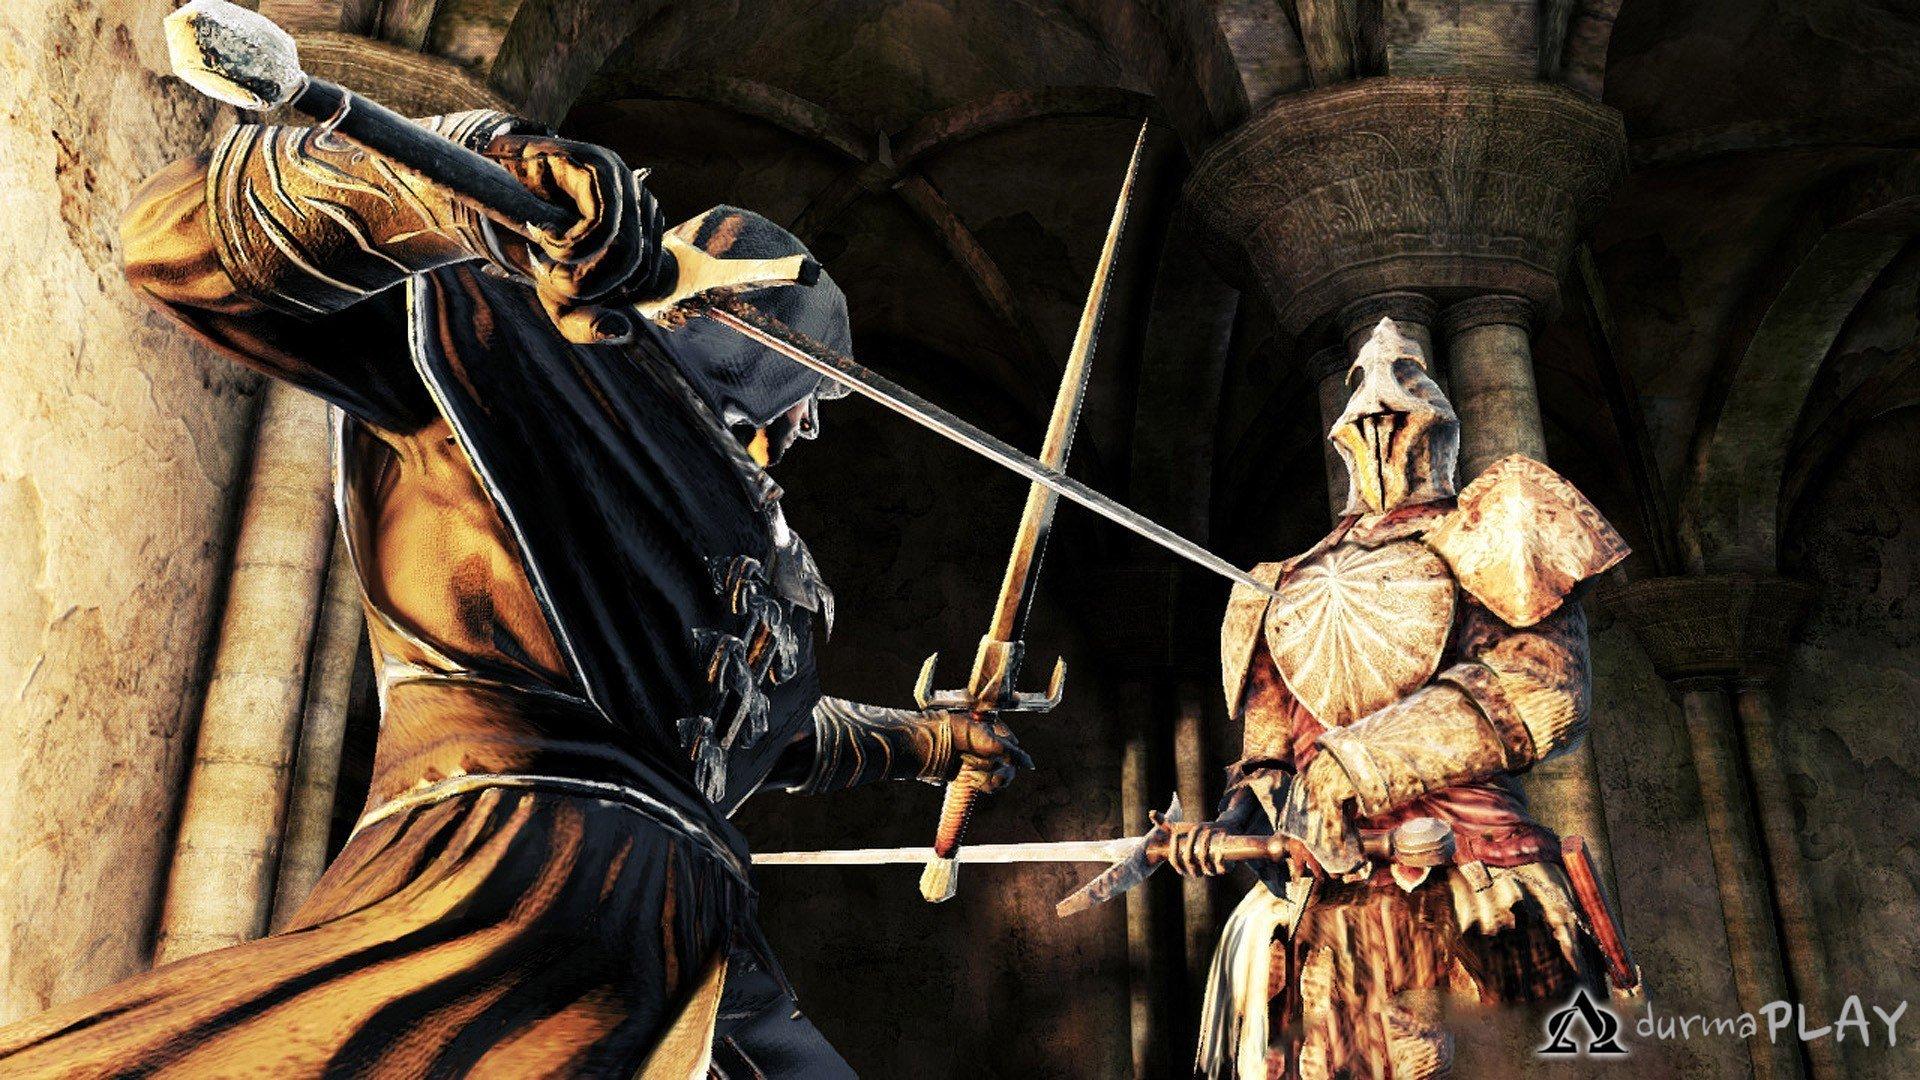 Dark Souls 2 PS3 Playstation 3 Satn Al 1920x1080